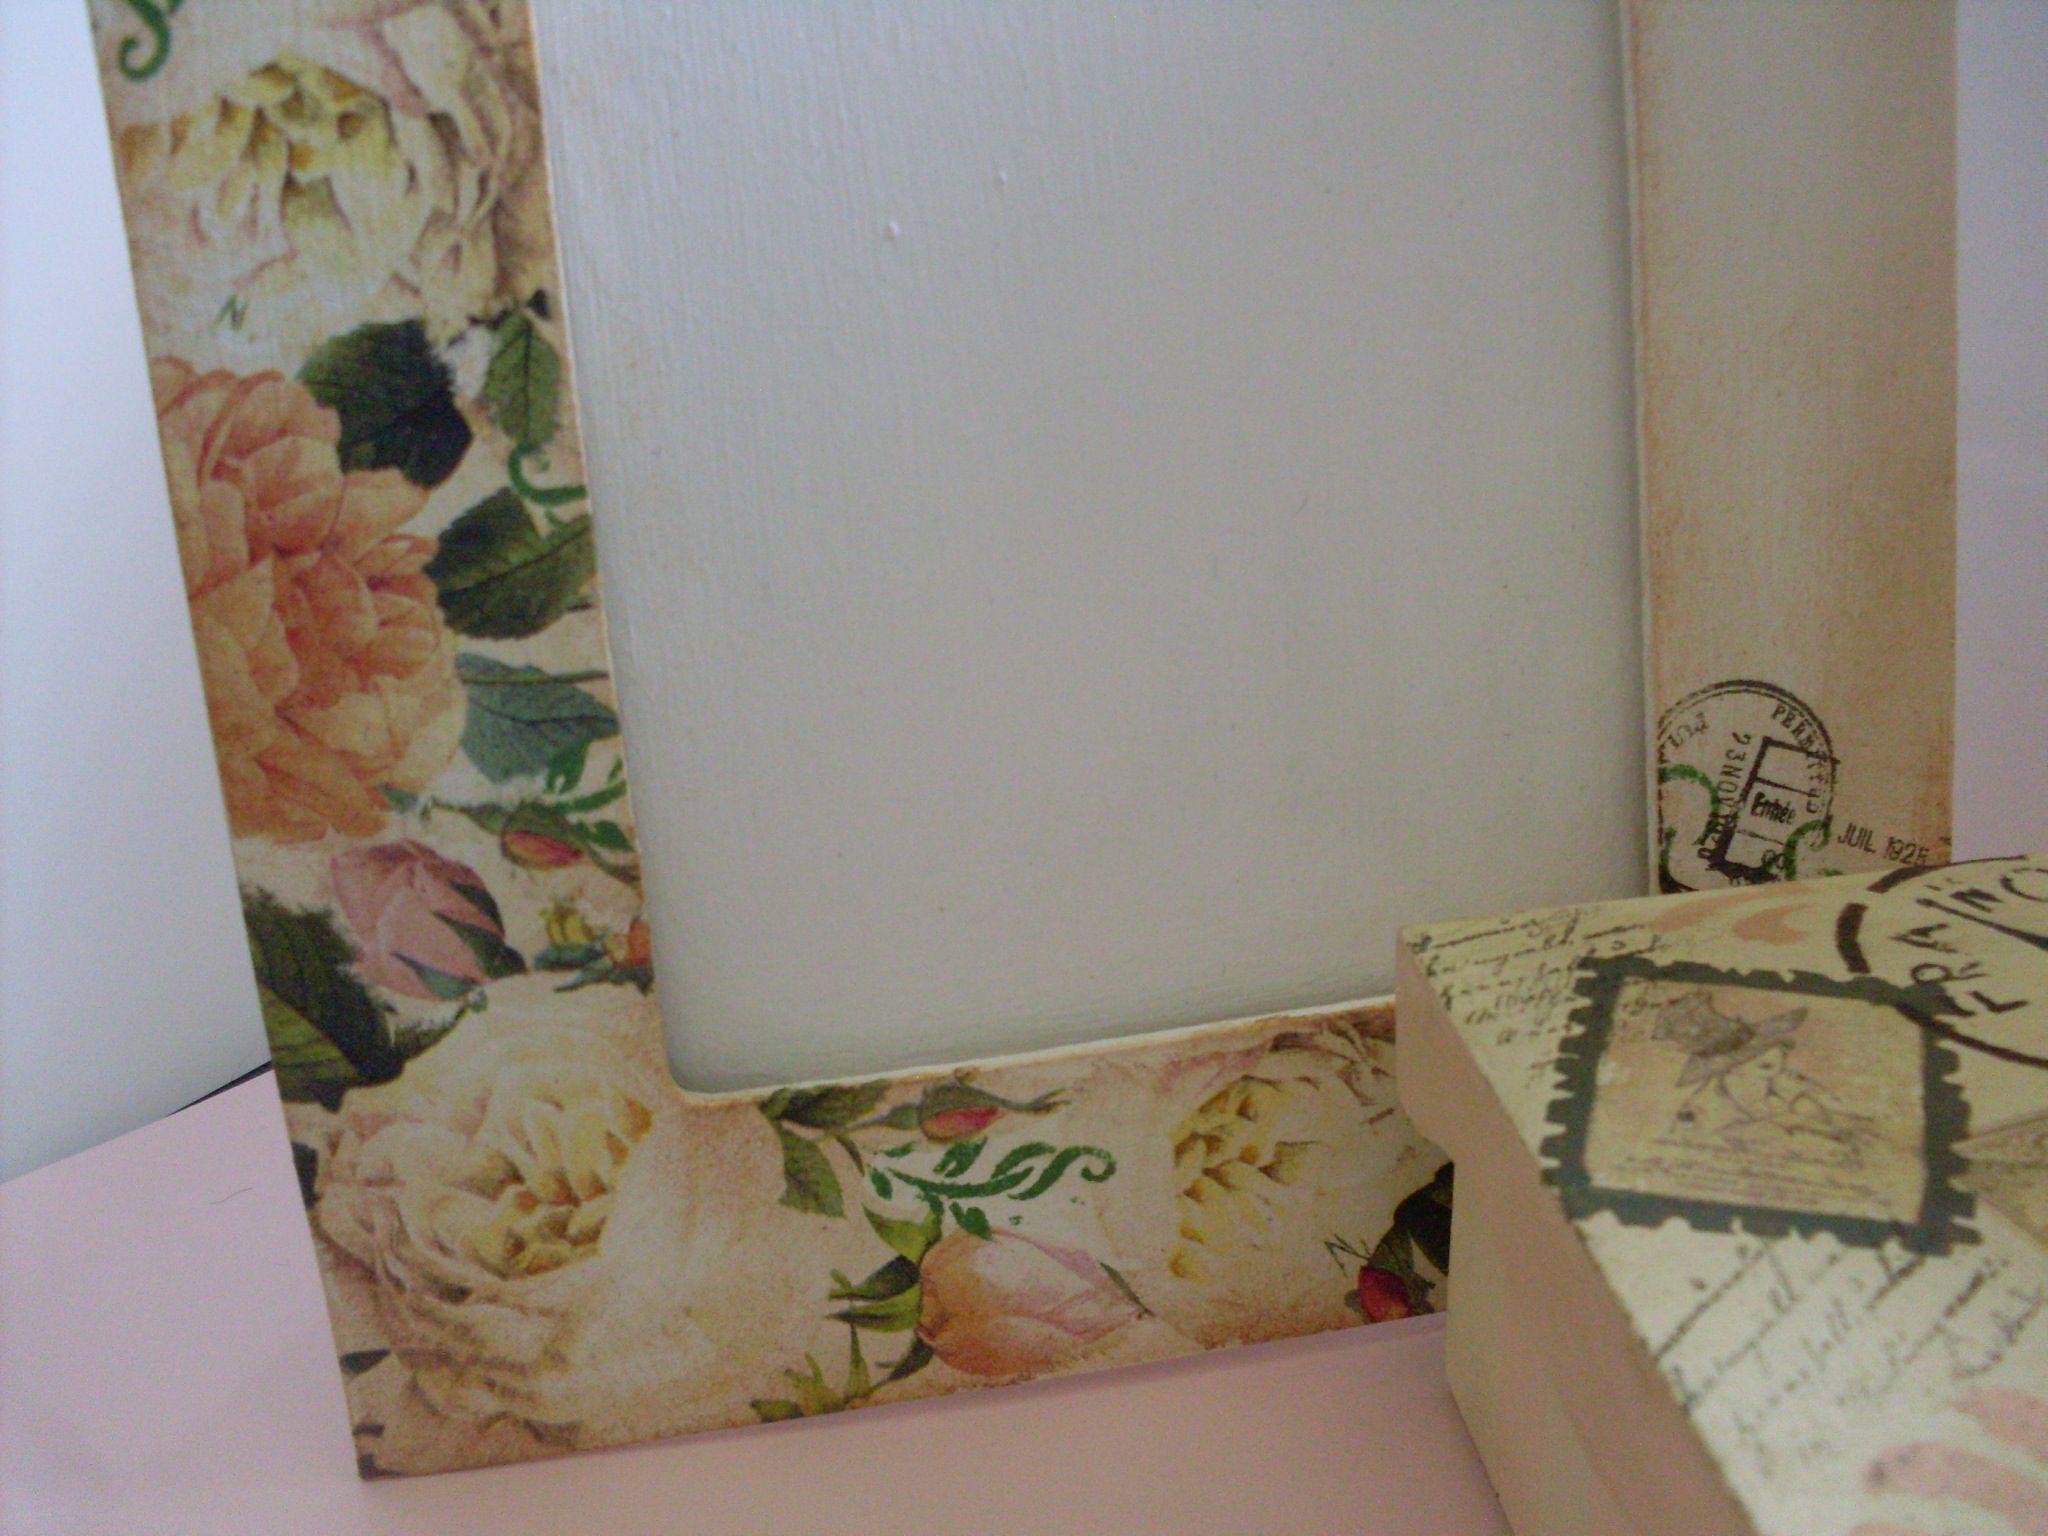 como hacer portaretratos de madera decorados buscar con google. Black Bedroom Furniture Sets. Home Design Ideas